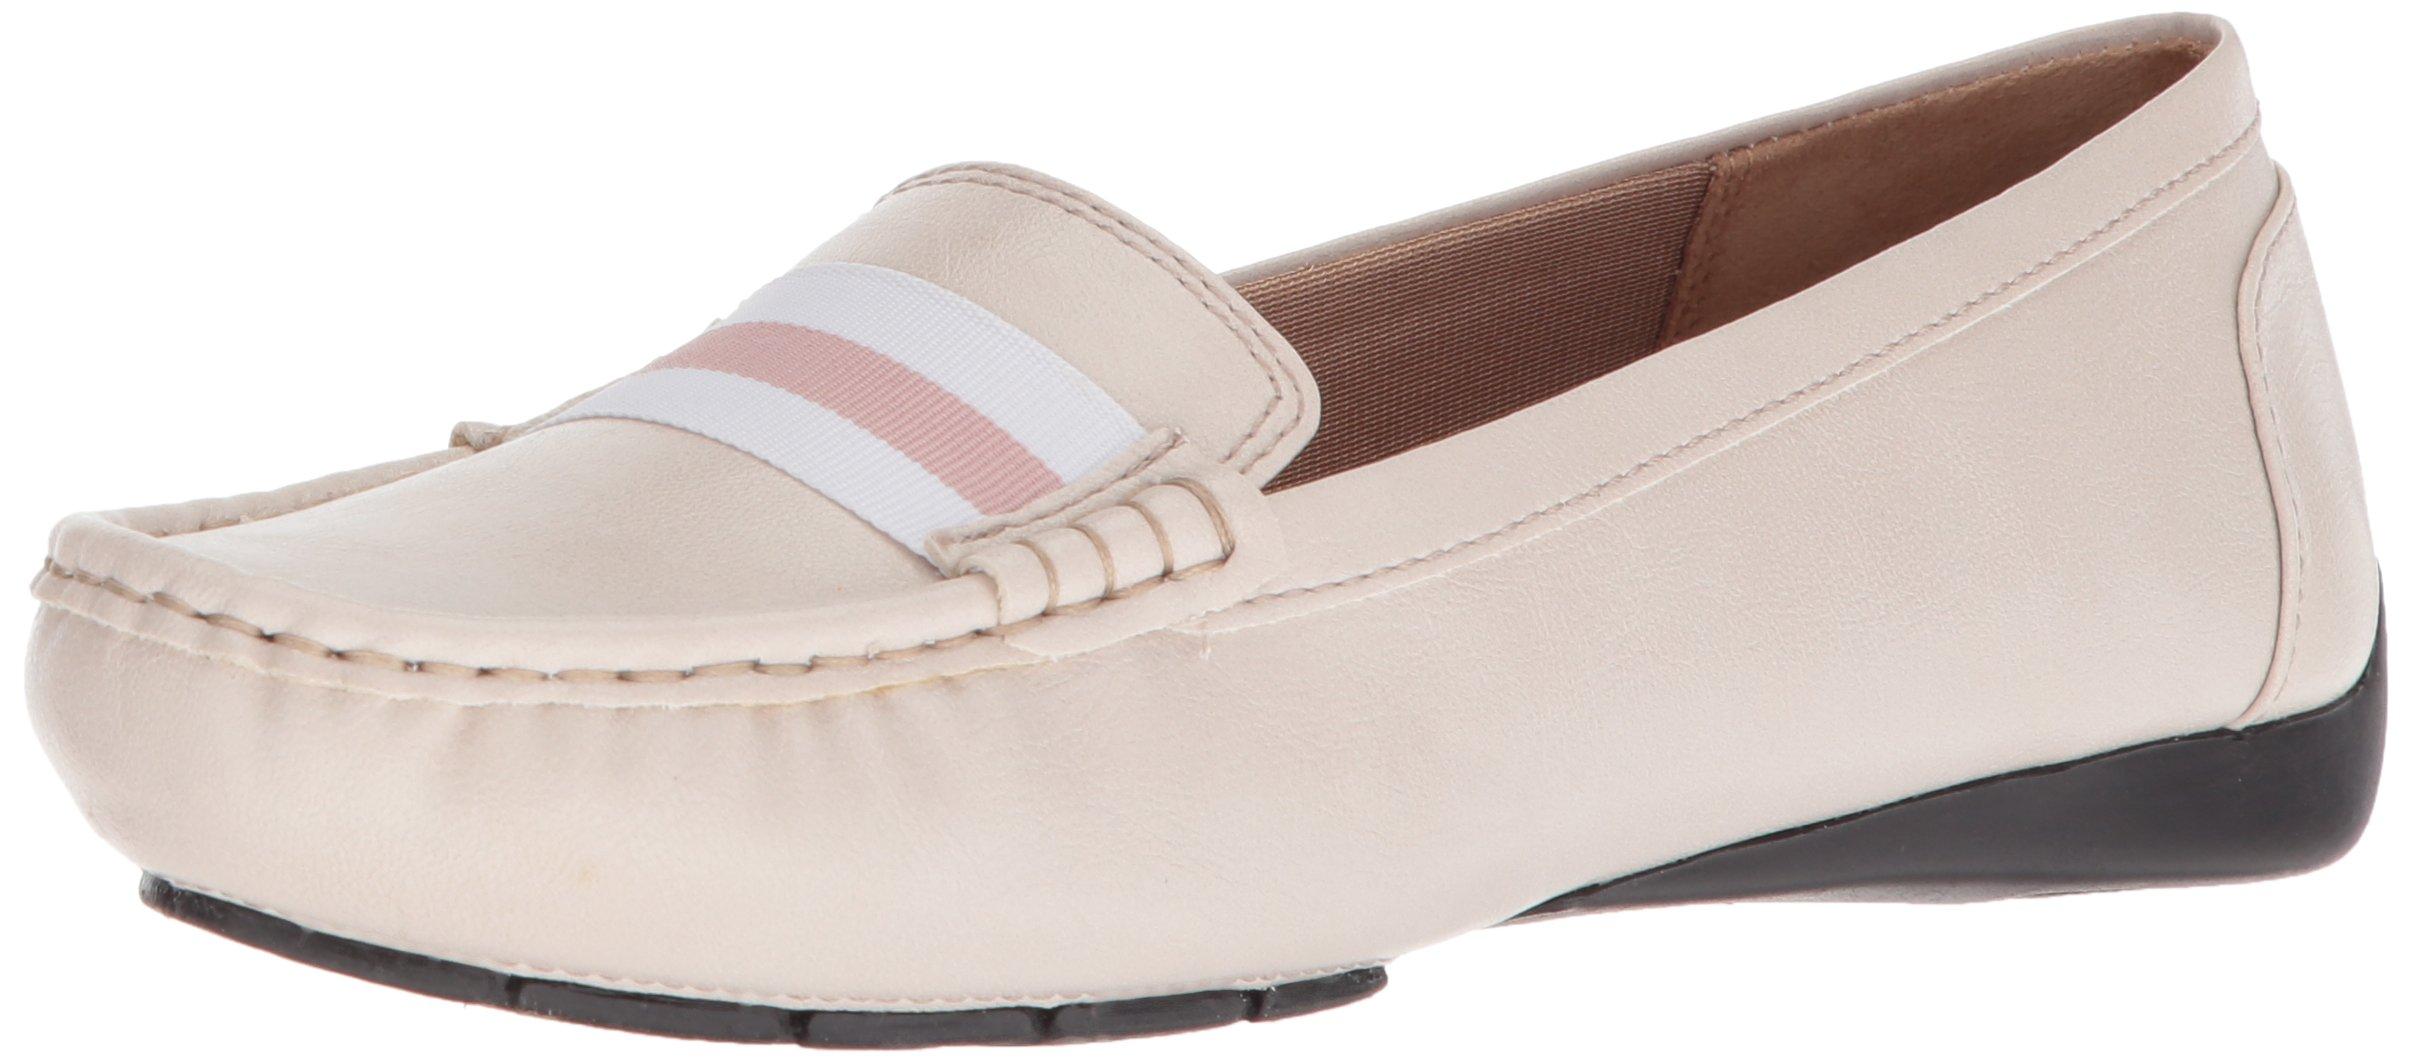 LifeStride Women's Vila Driving Style Loafer, Blush, 8.5 W US